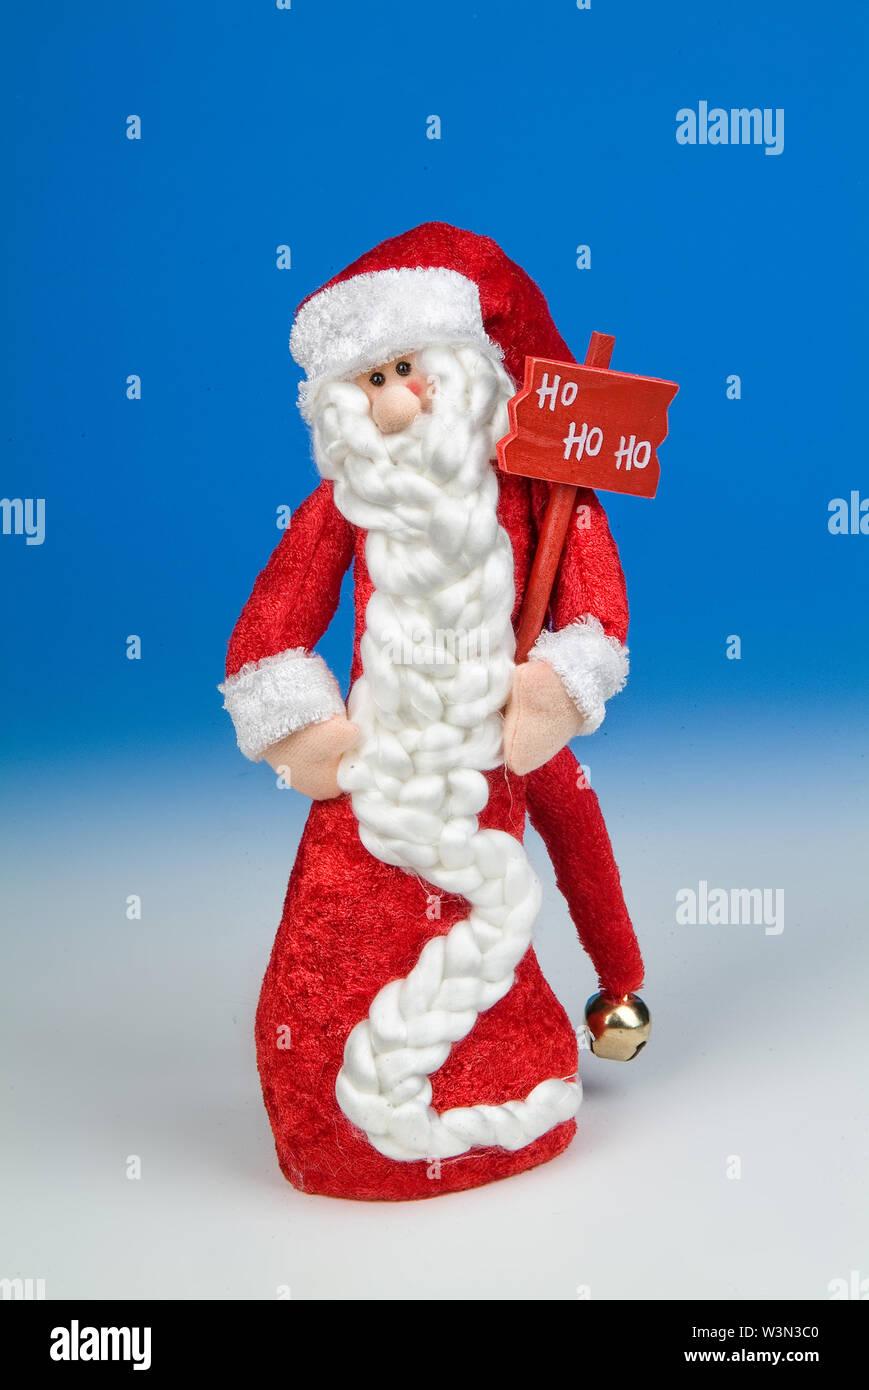 Santa Klaus statuette on a studio background - Stock Image